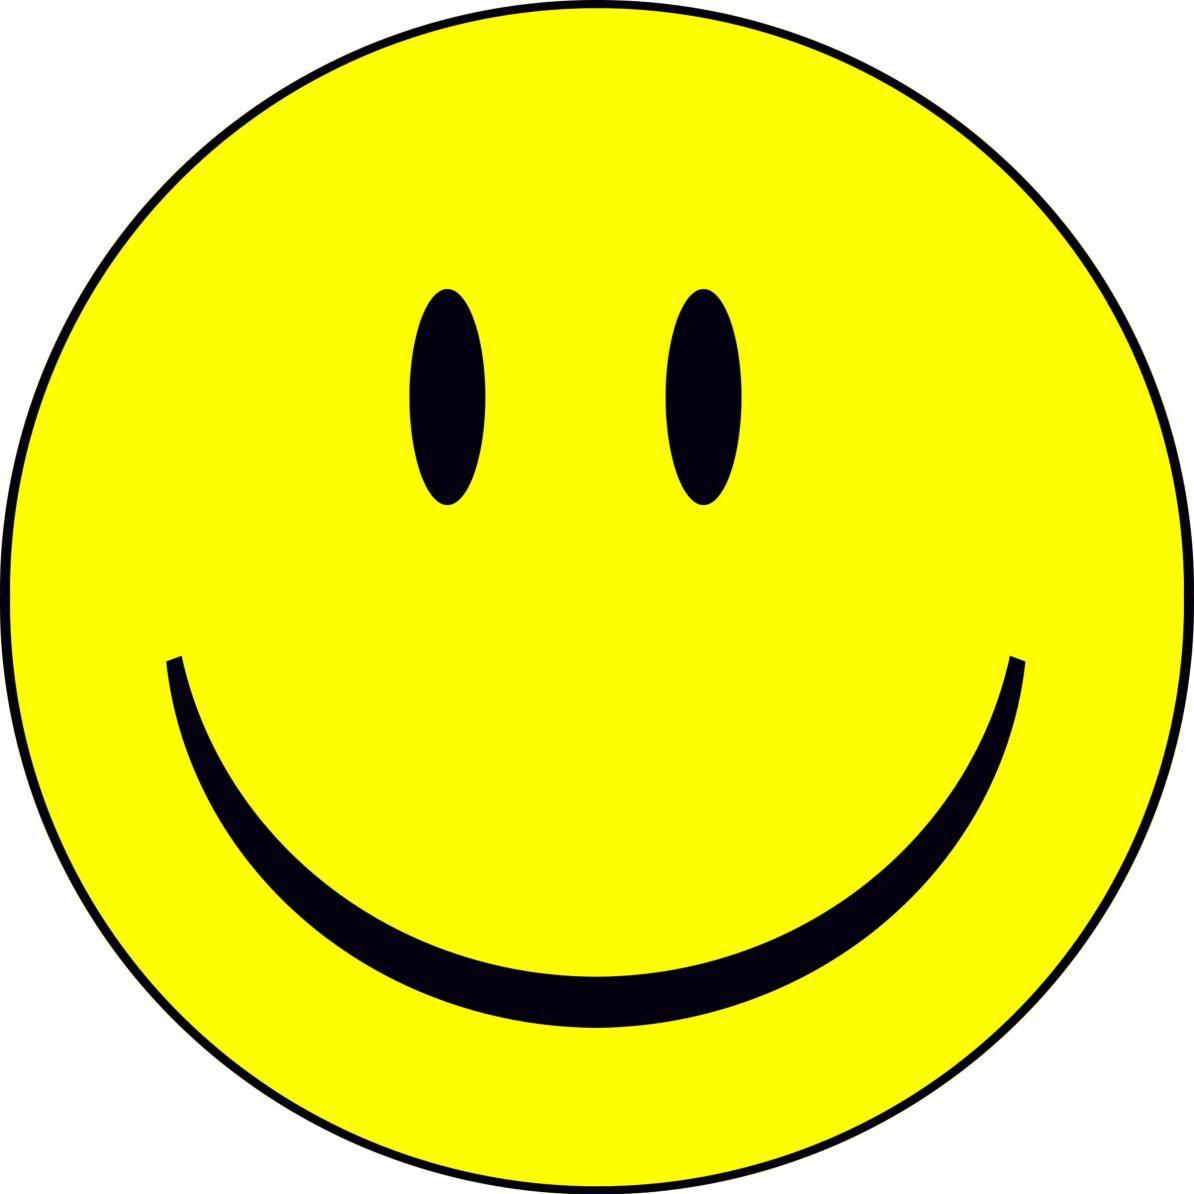 free happy face clip art smiley face clip art smile day site clipart best clipart best [ 1194 x 1194 Pixel ]